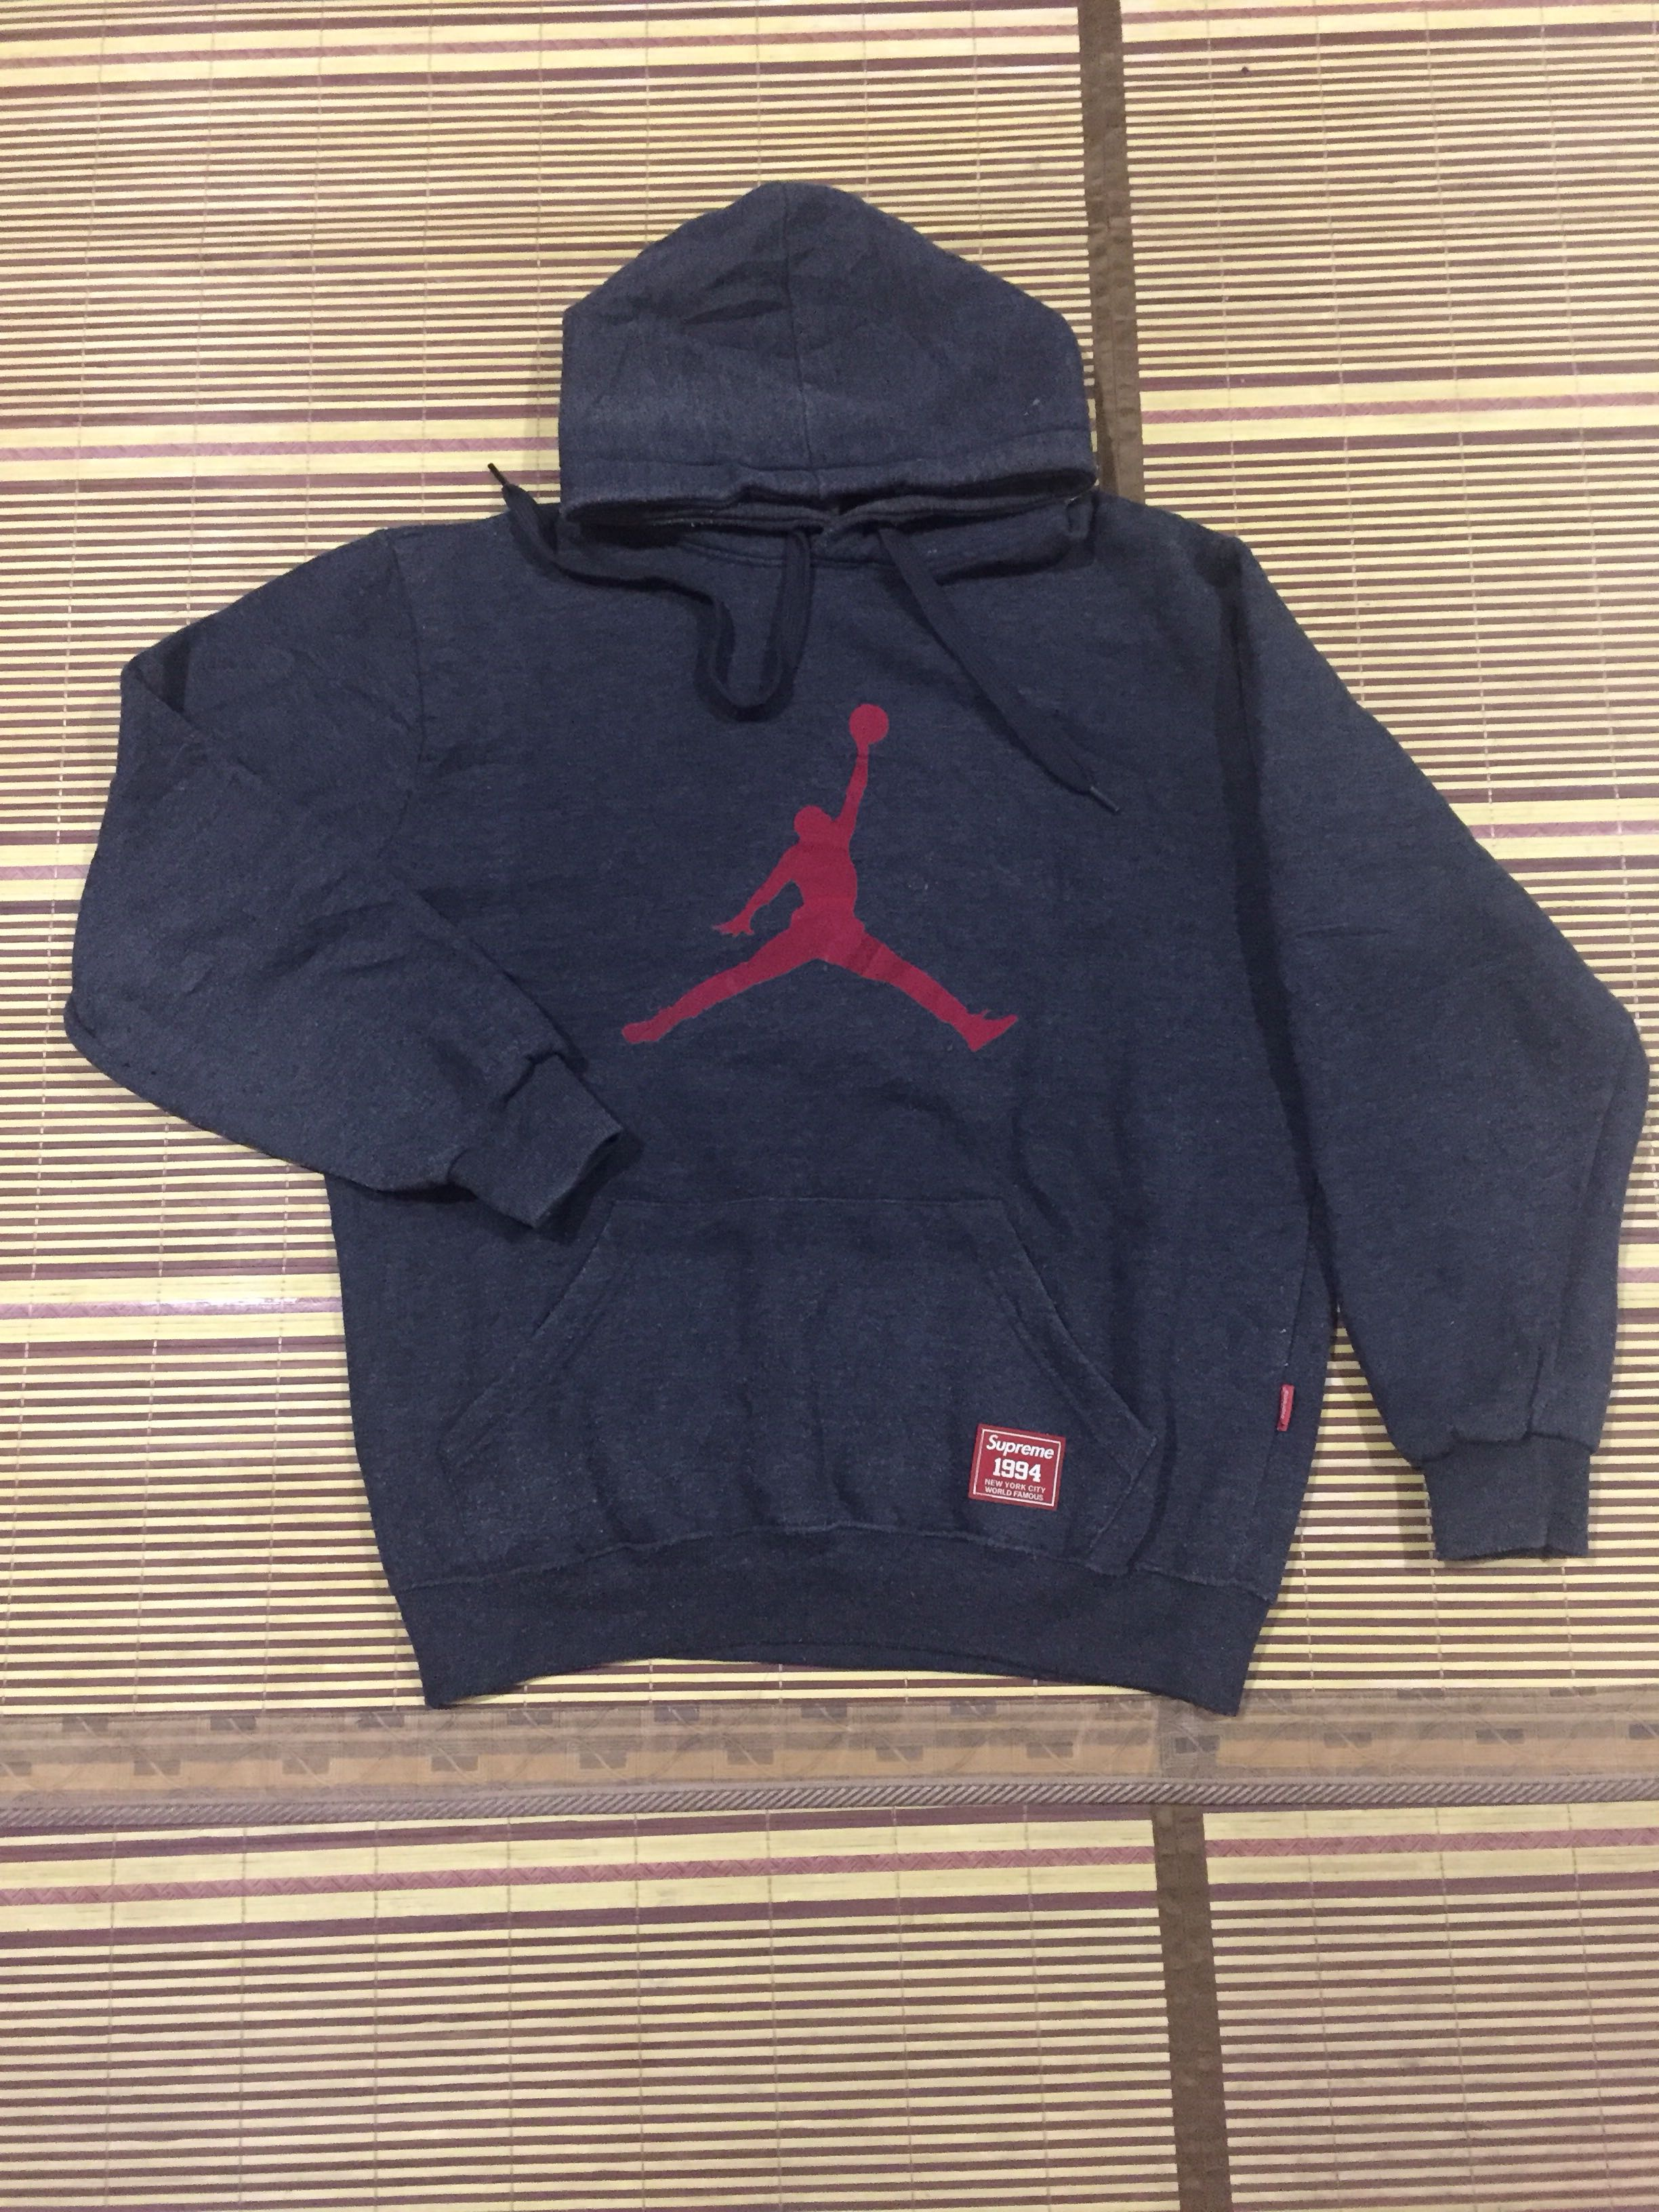 niższa cena z San Francisco klasyczne buty Supreme Air Jordan Hoodie